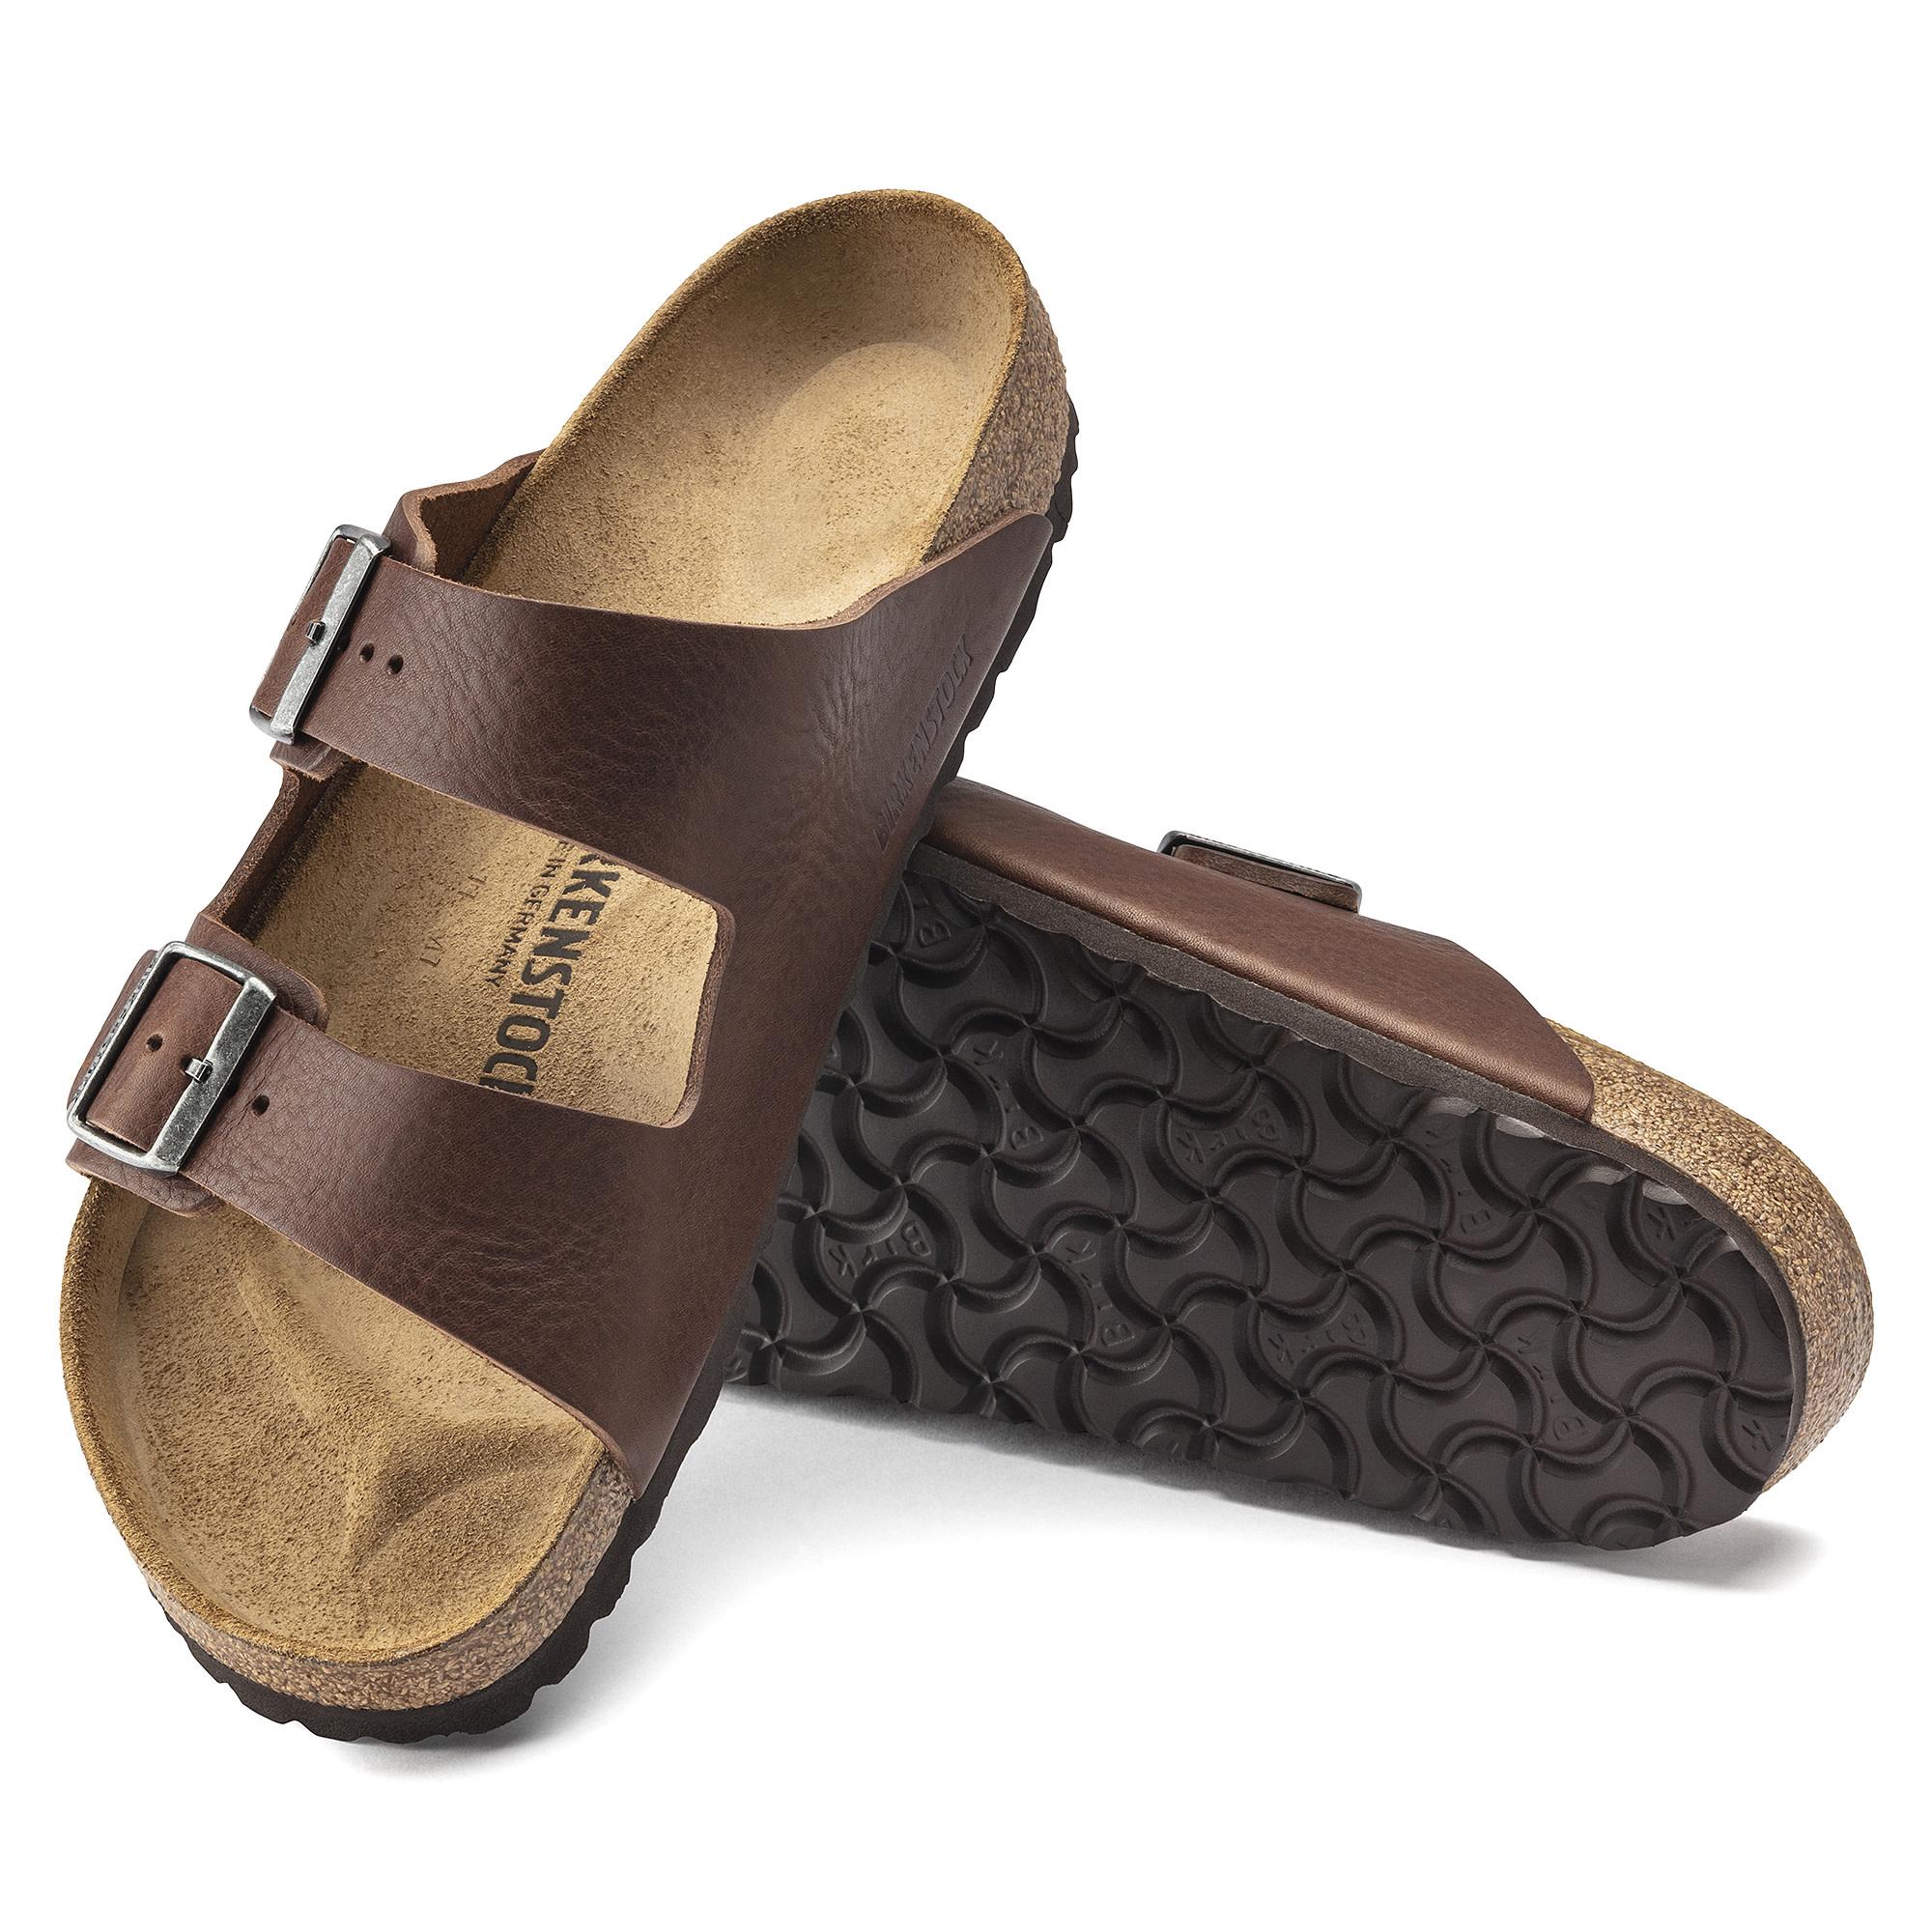 Birkenstock Birkenstock Arizona  Leather (Hommes - Régulier) - Vintage Roast